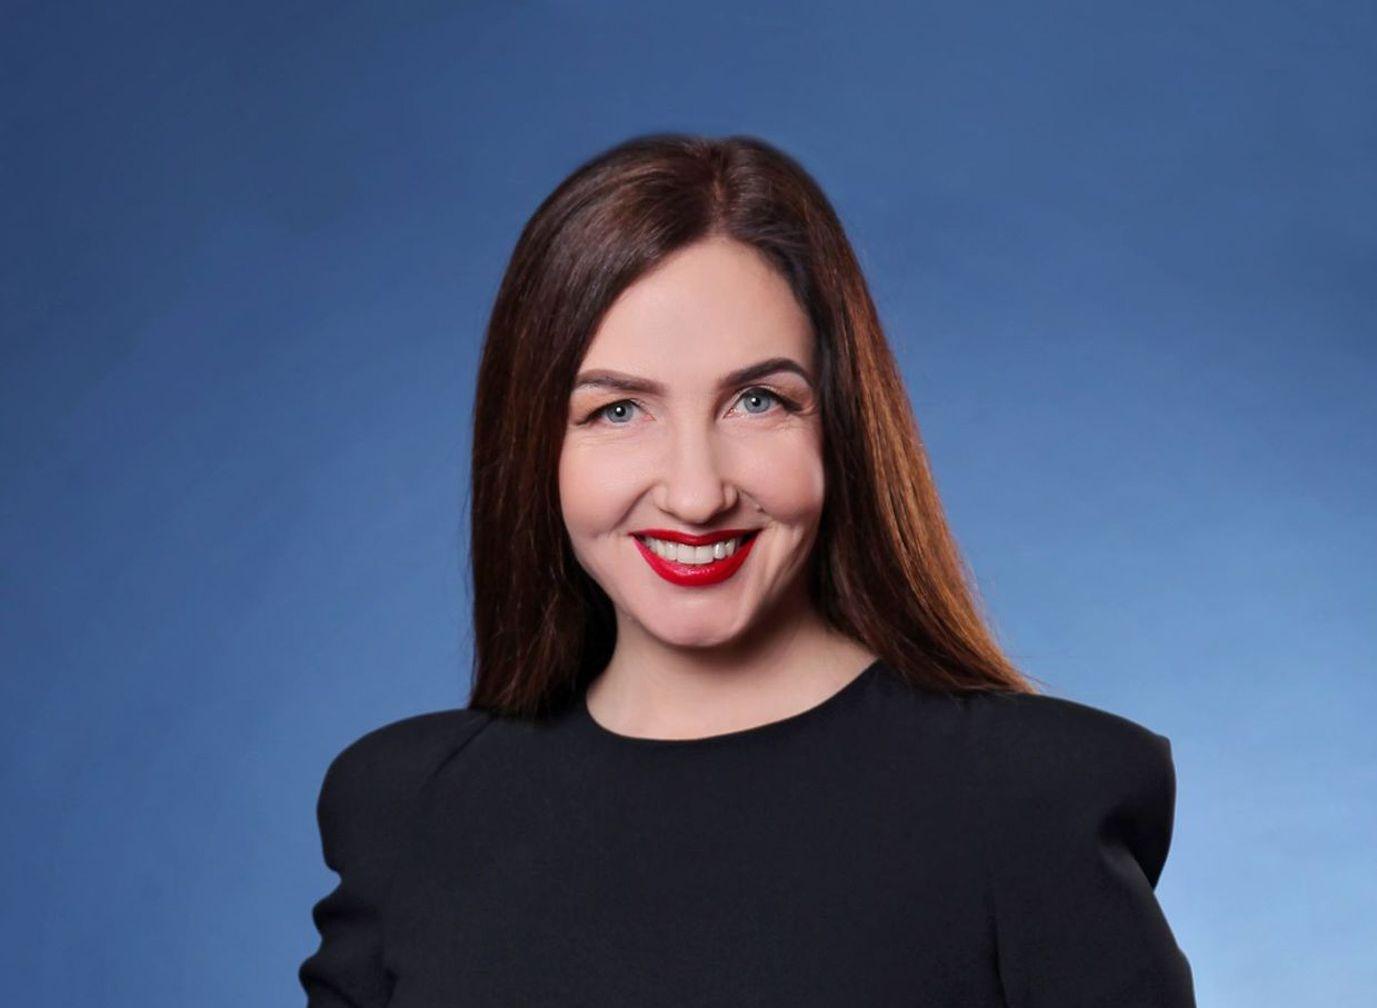 Raimonda Lazauskienė